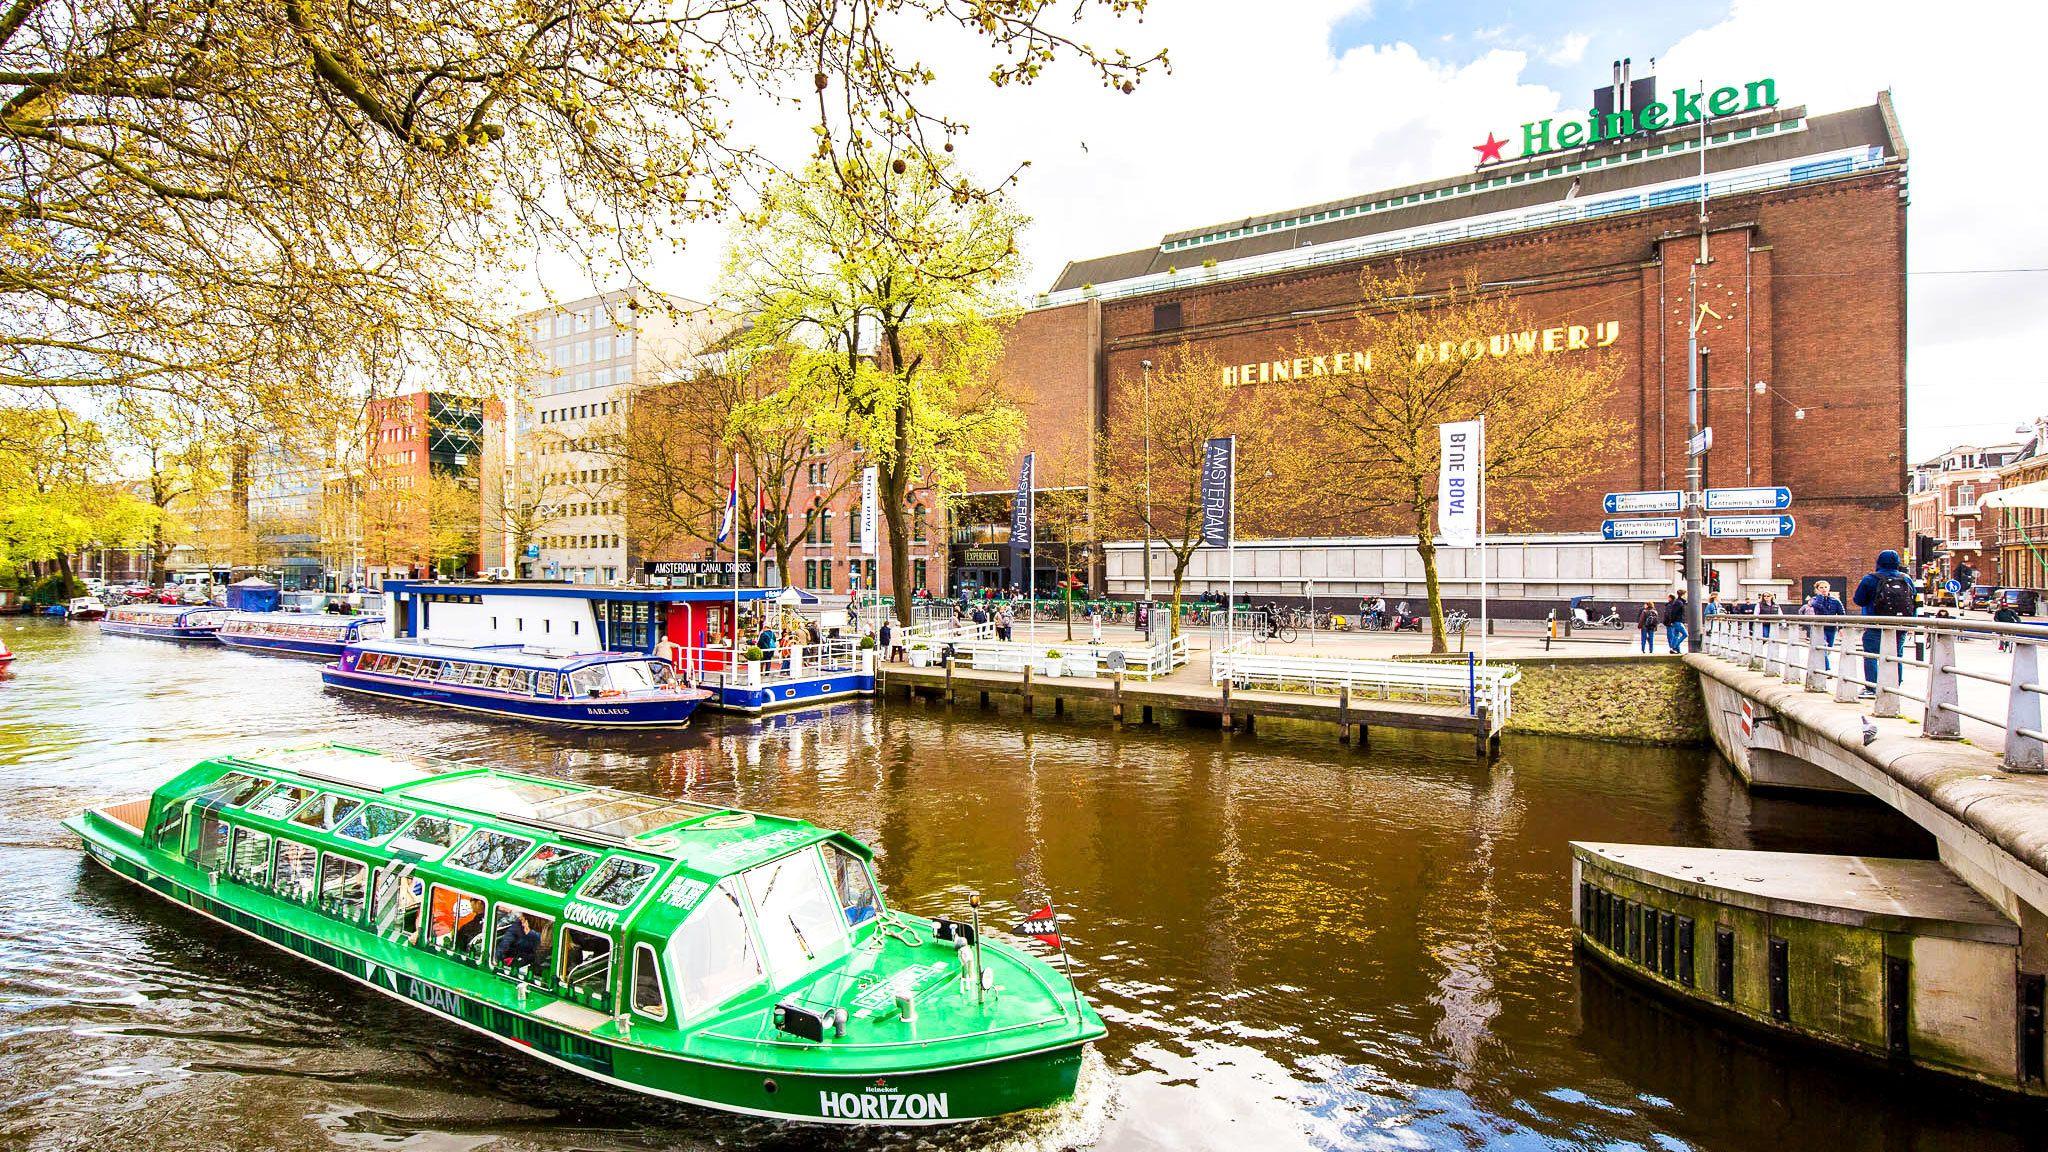 Skip-The-Line Heineken Experience Ticket & Canal Cruise